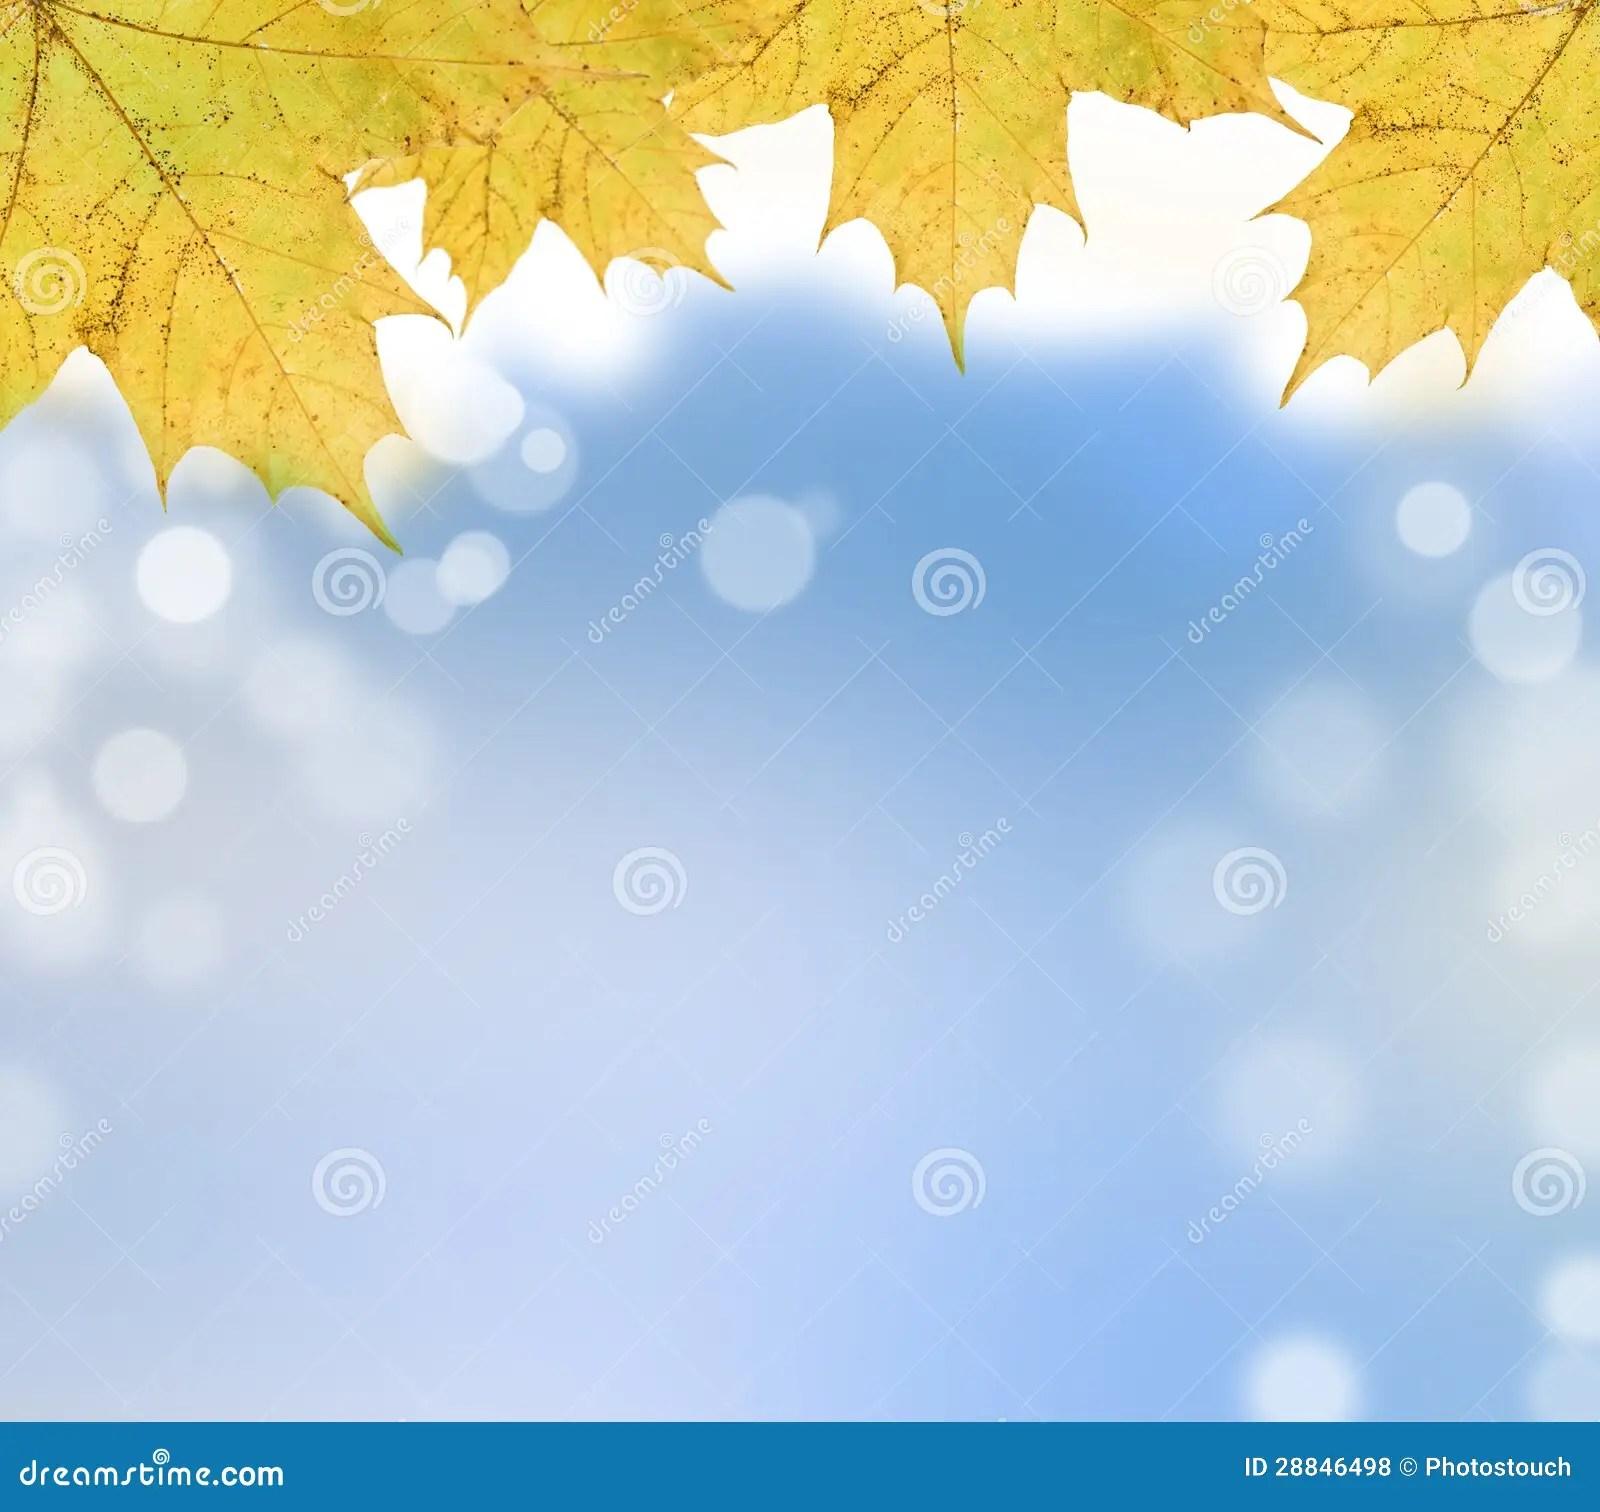 Fall Leaves Wallpaper Border Autumn Leaves On Soft Background Stock Illustration